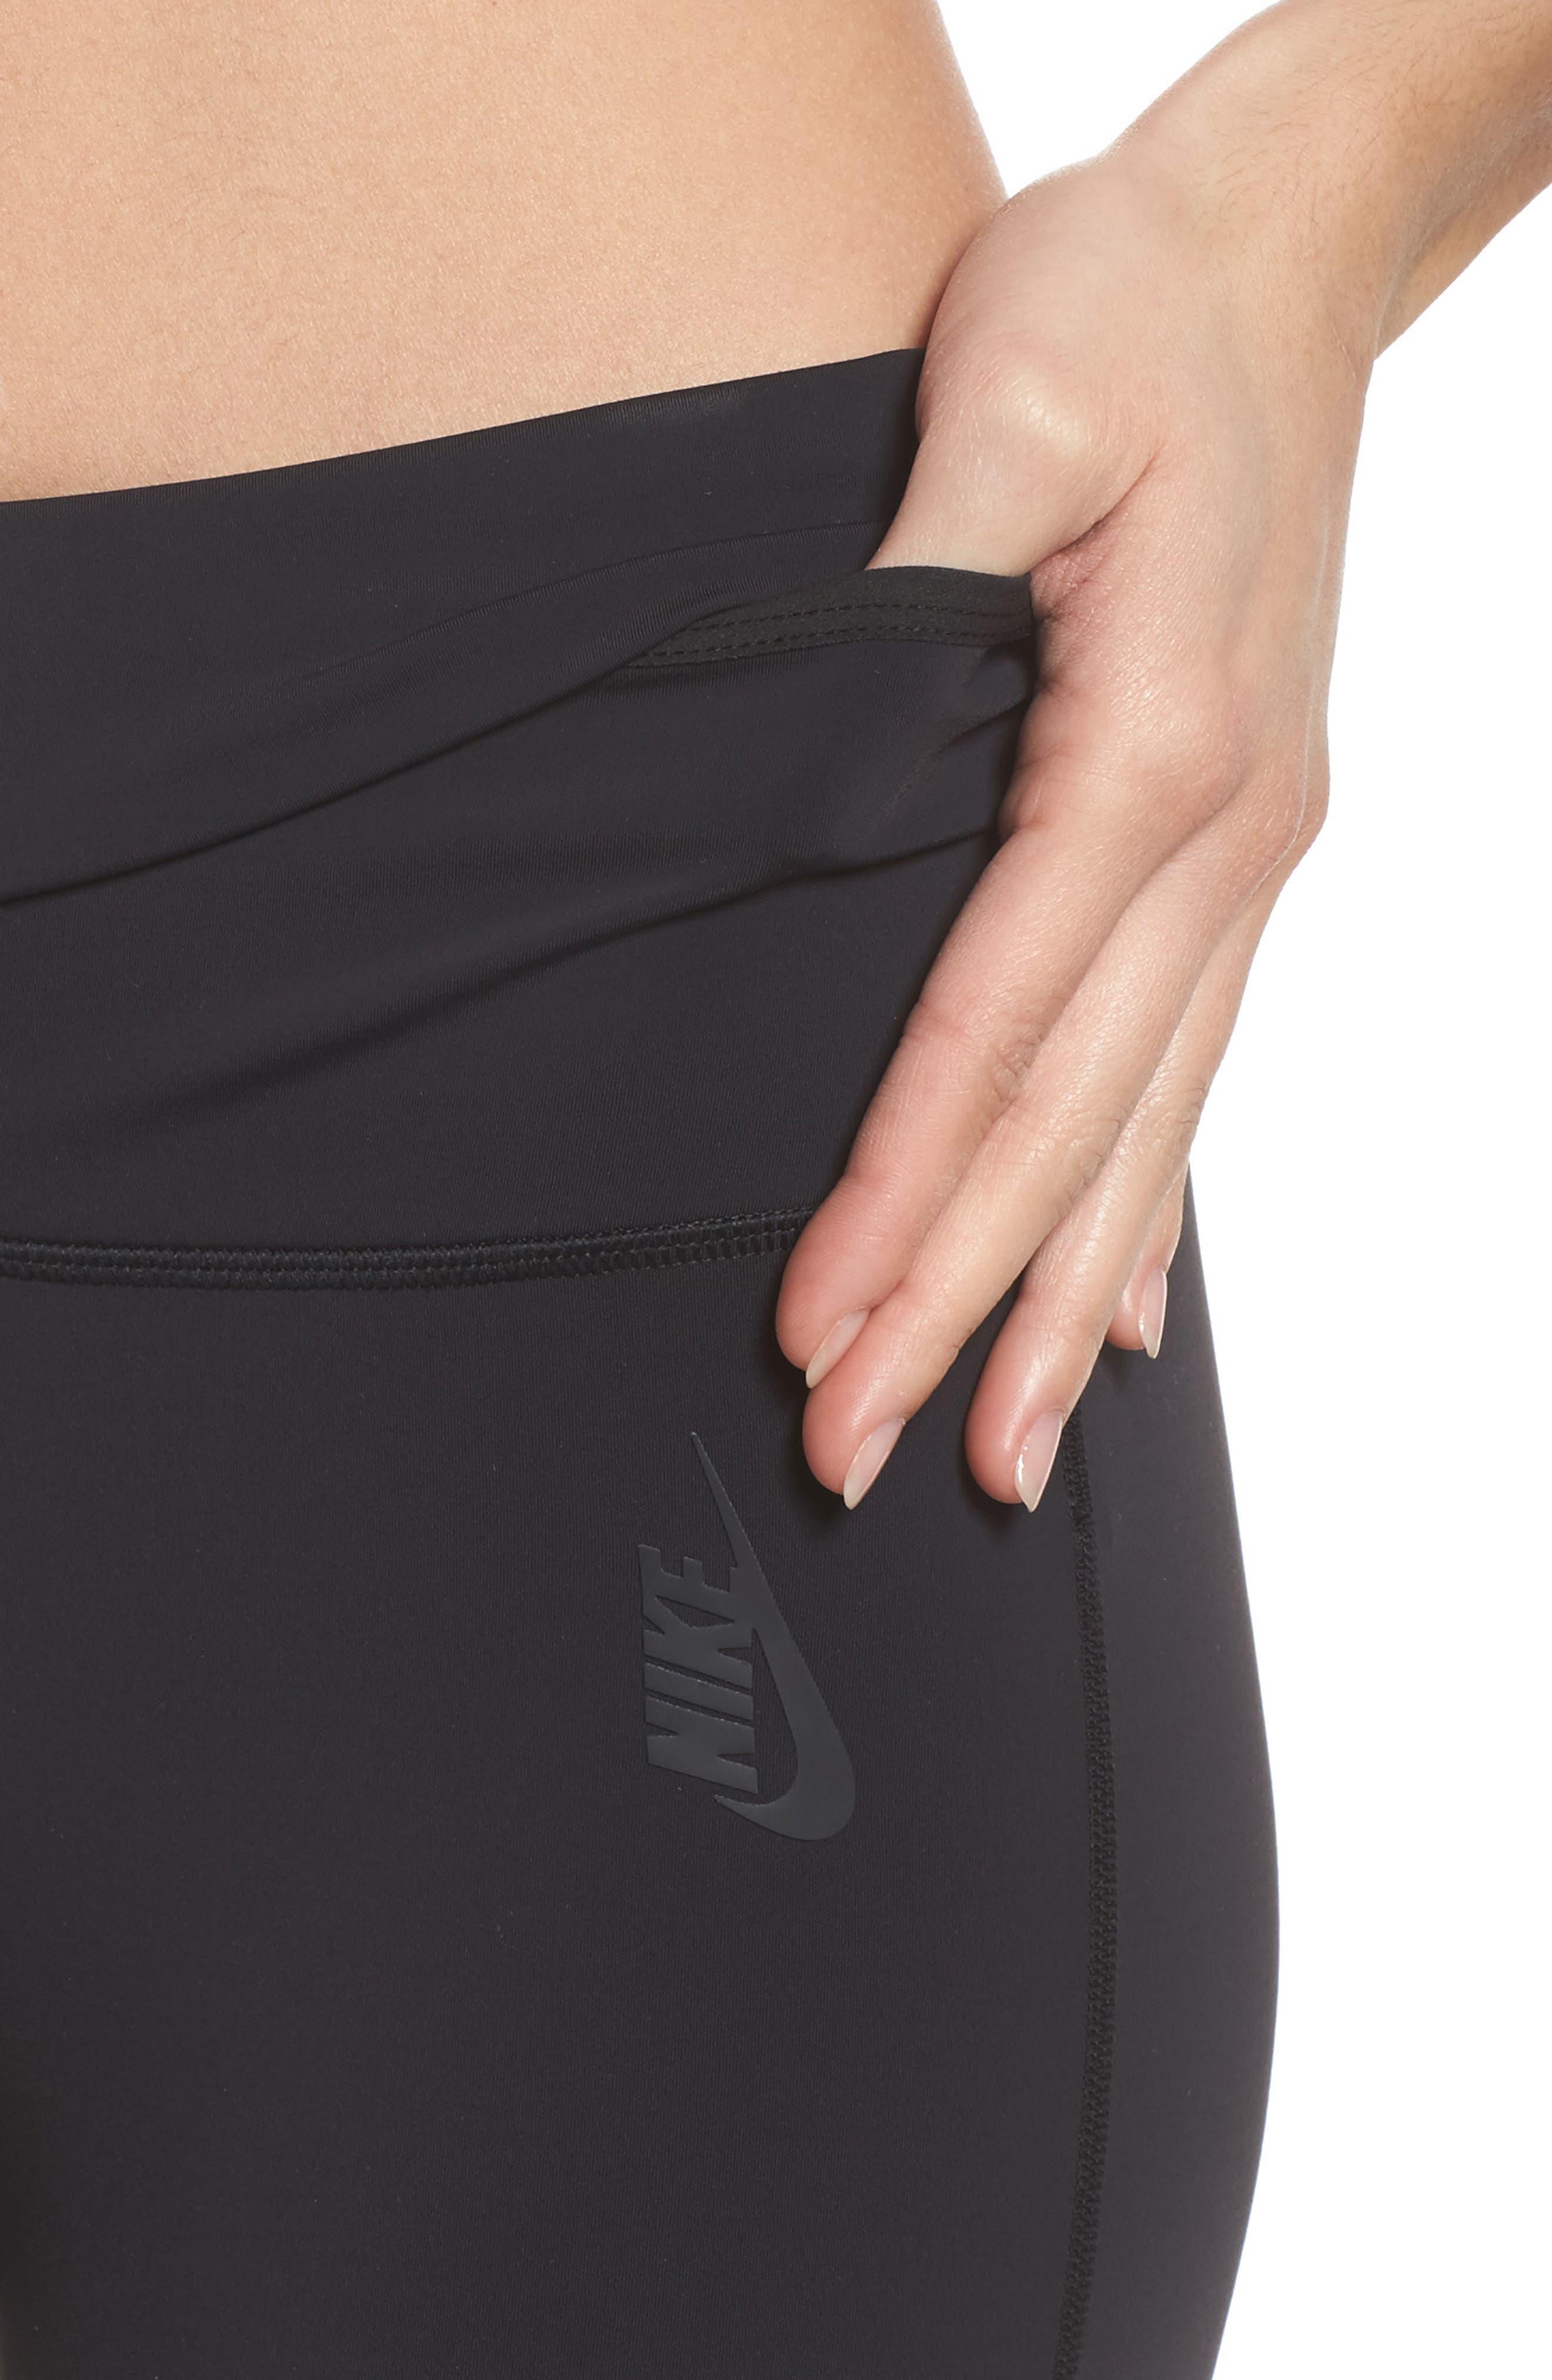 NikeLab Women's Tights,                             Alternate thumbnail 4, color,                             Black/ Black